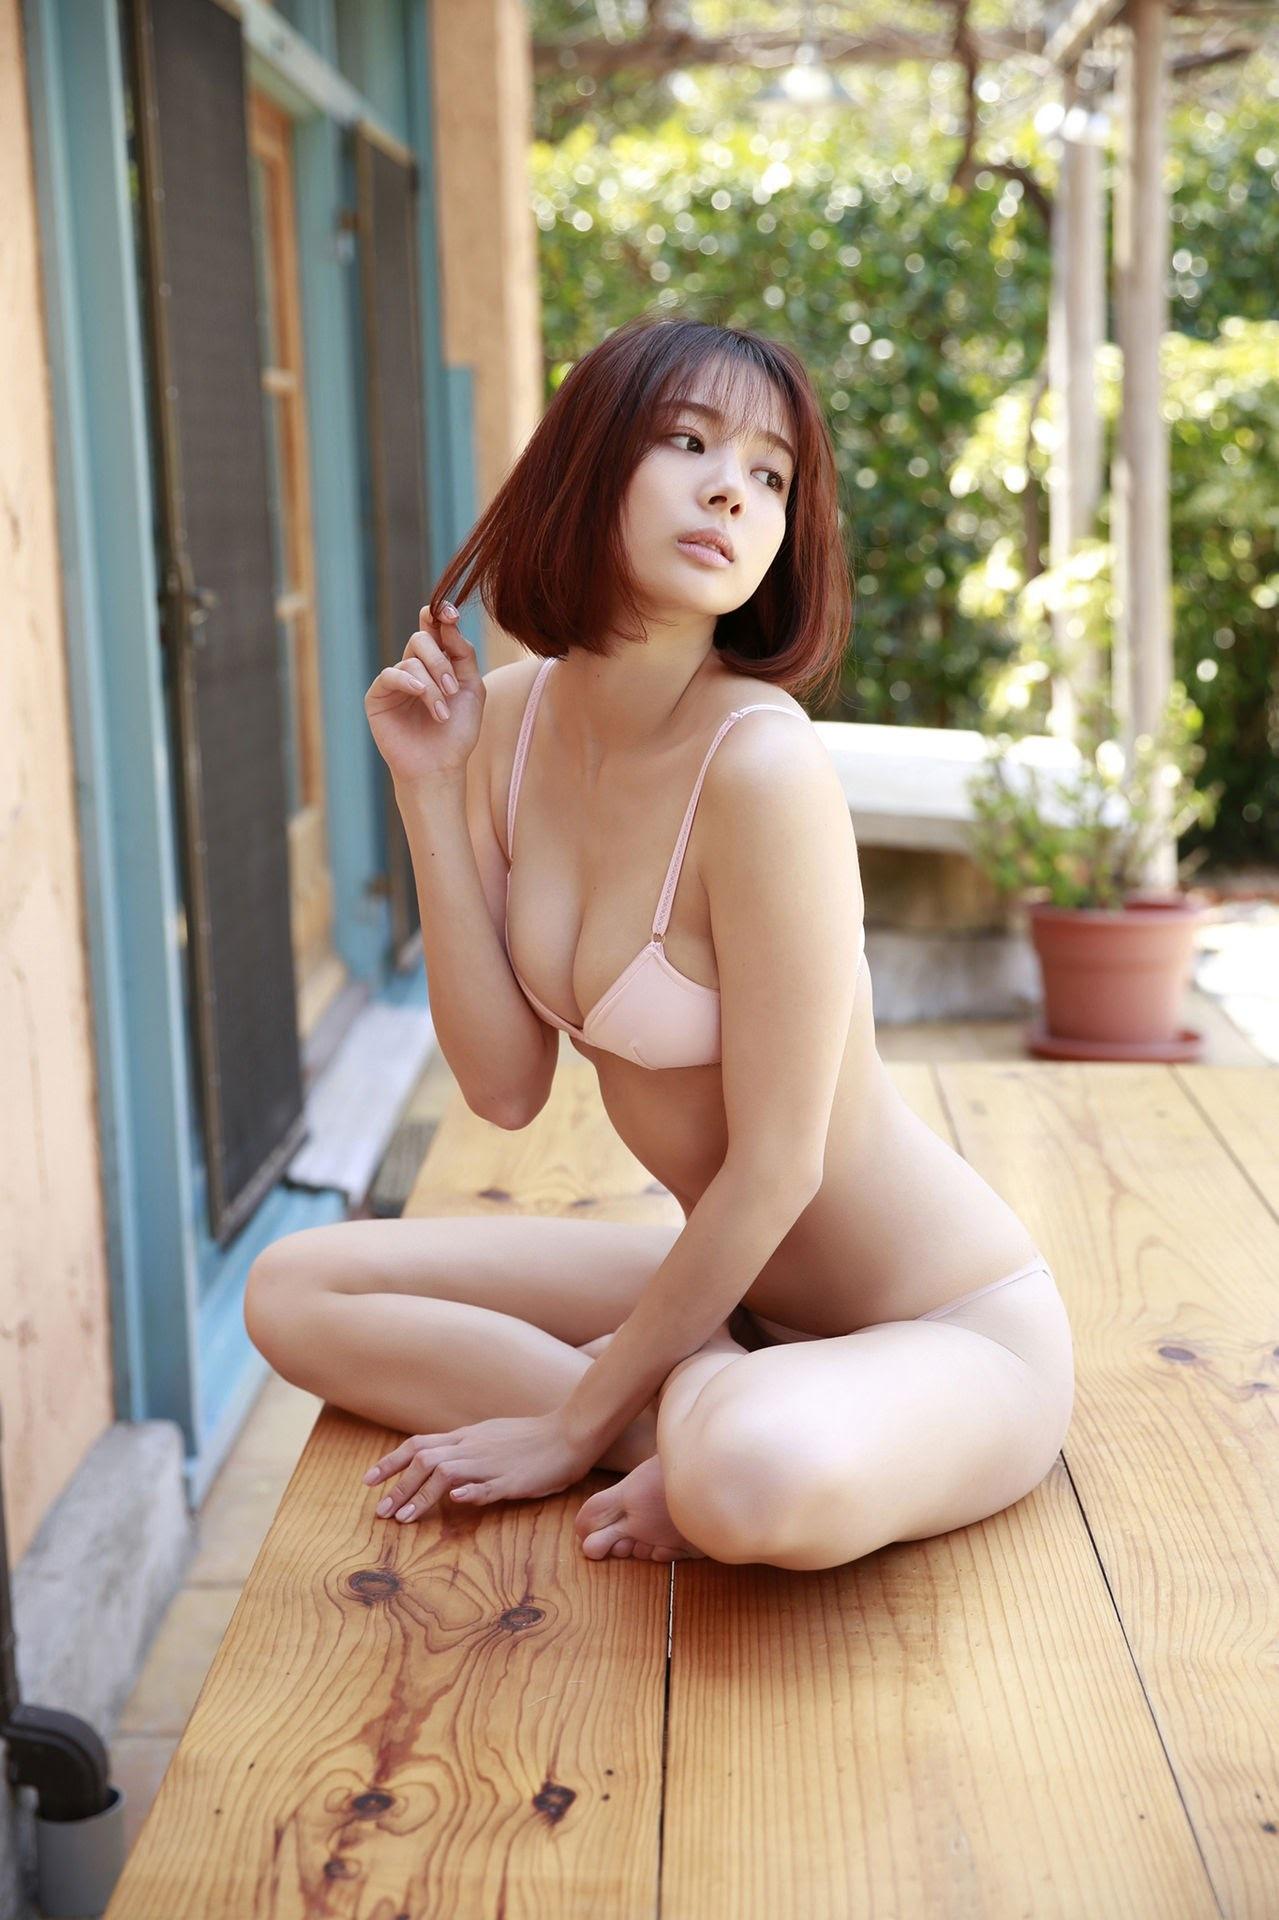 23 years old Shaka Okada, who is also a professional mahjong player012